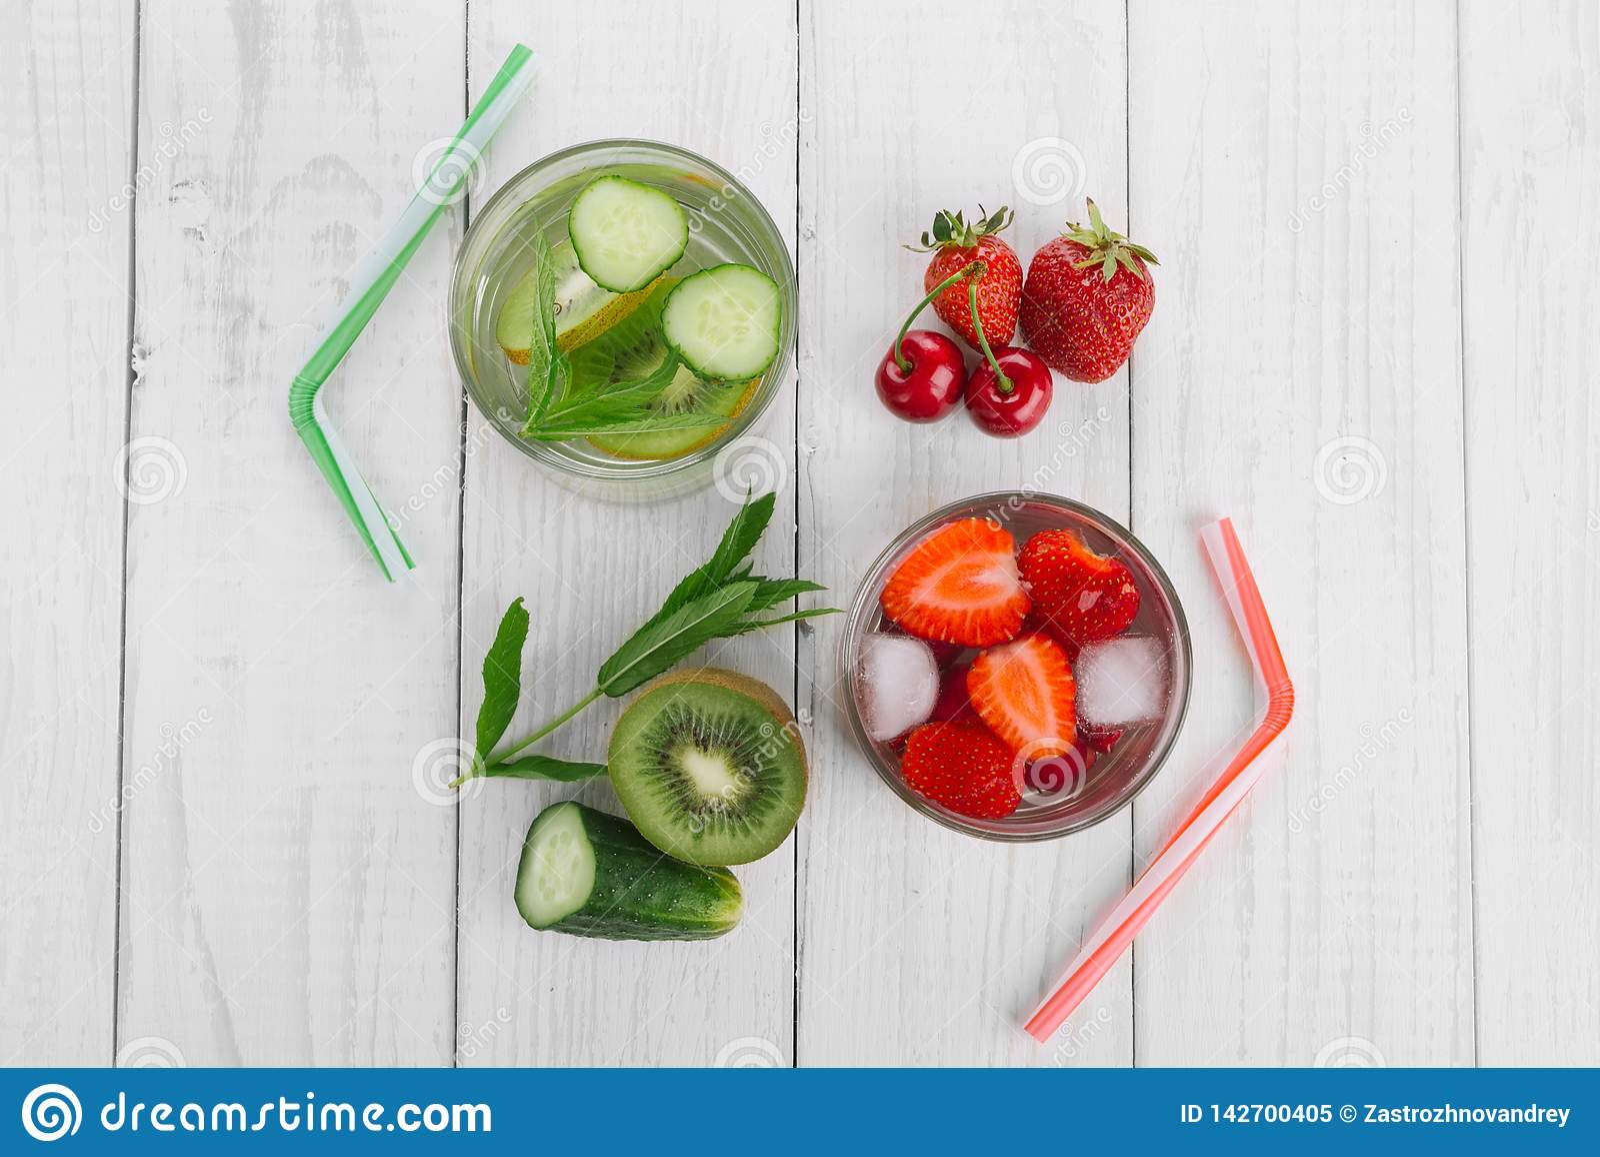 Cool water in glass, fresh green kiwi, mint and cucumber, strawberries and cherries. Fresh homemade vitamins